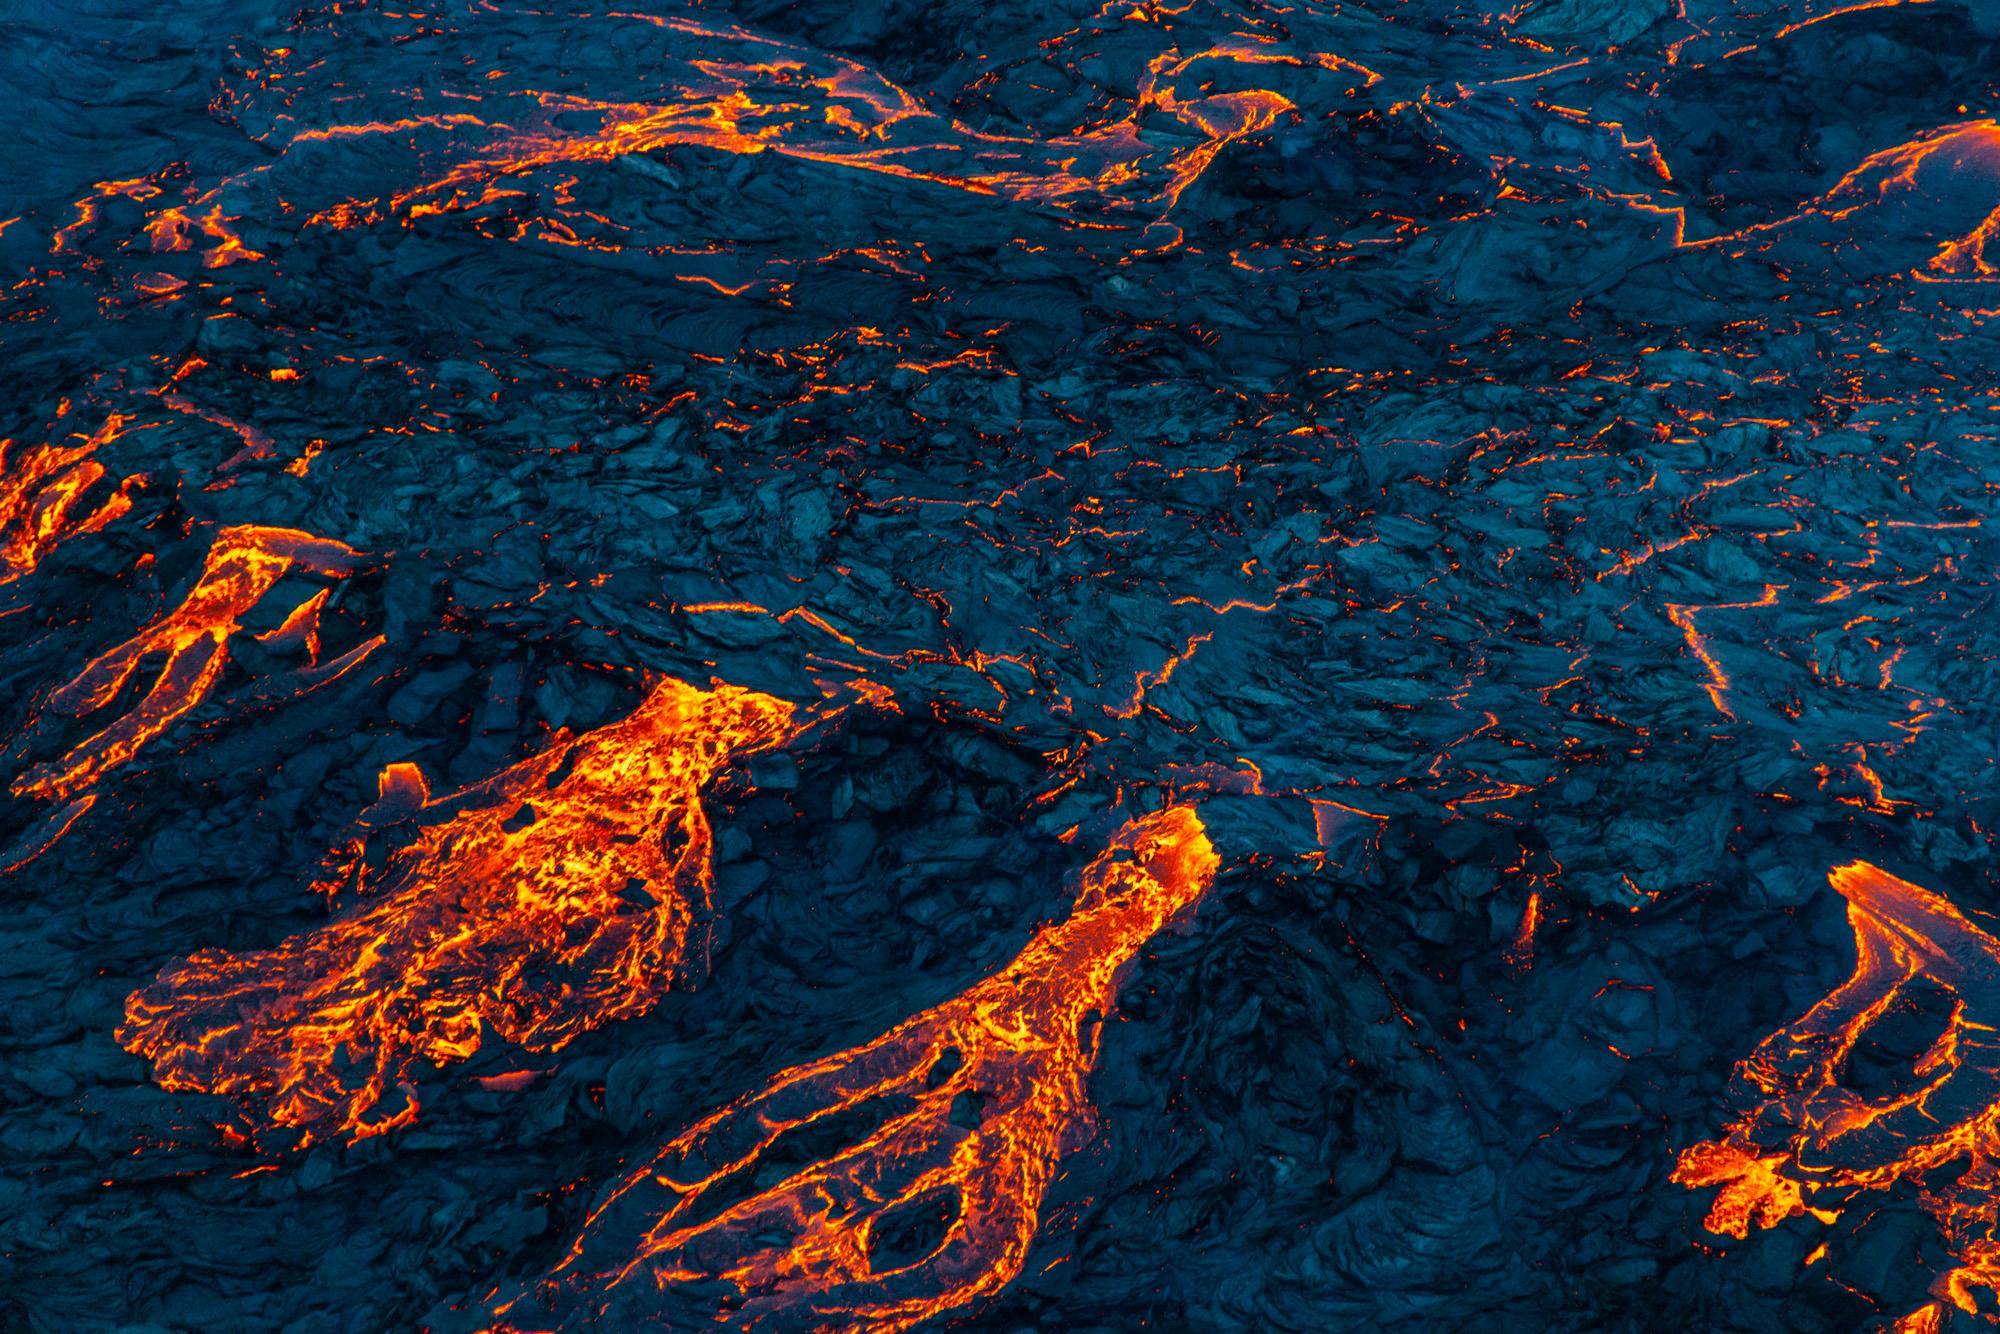 Volcanic_eruption_2021_1_vilhelmgunnarsson.jpg